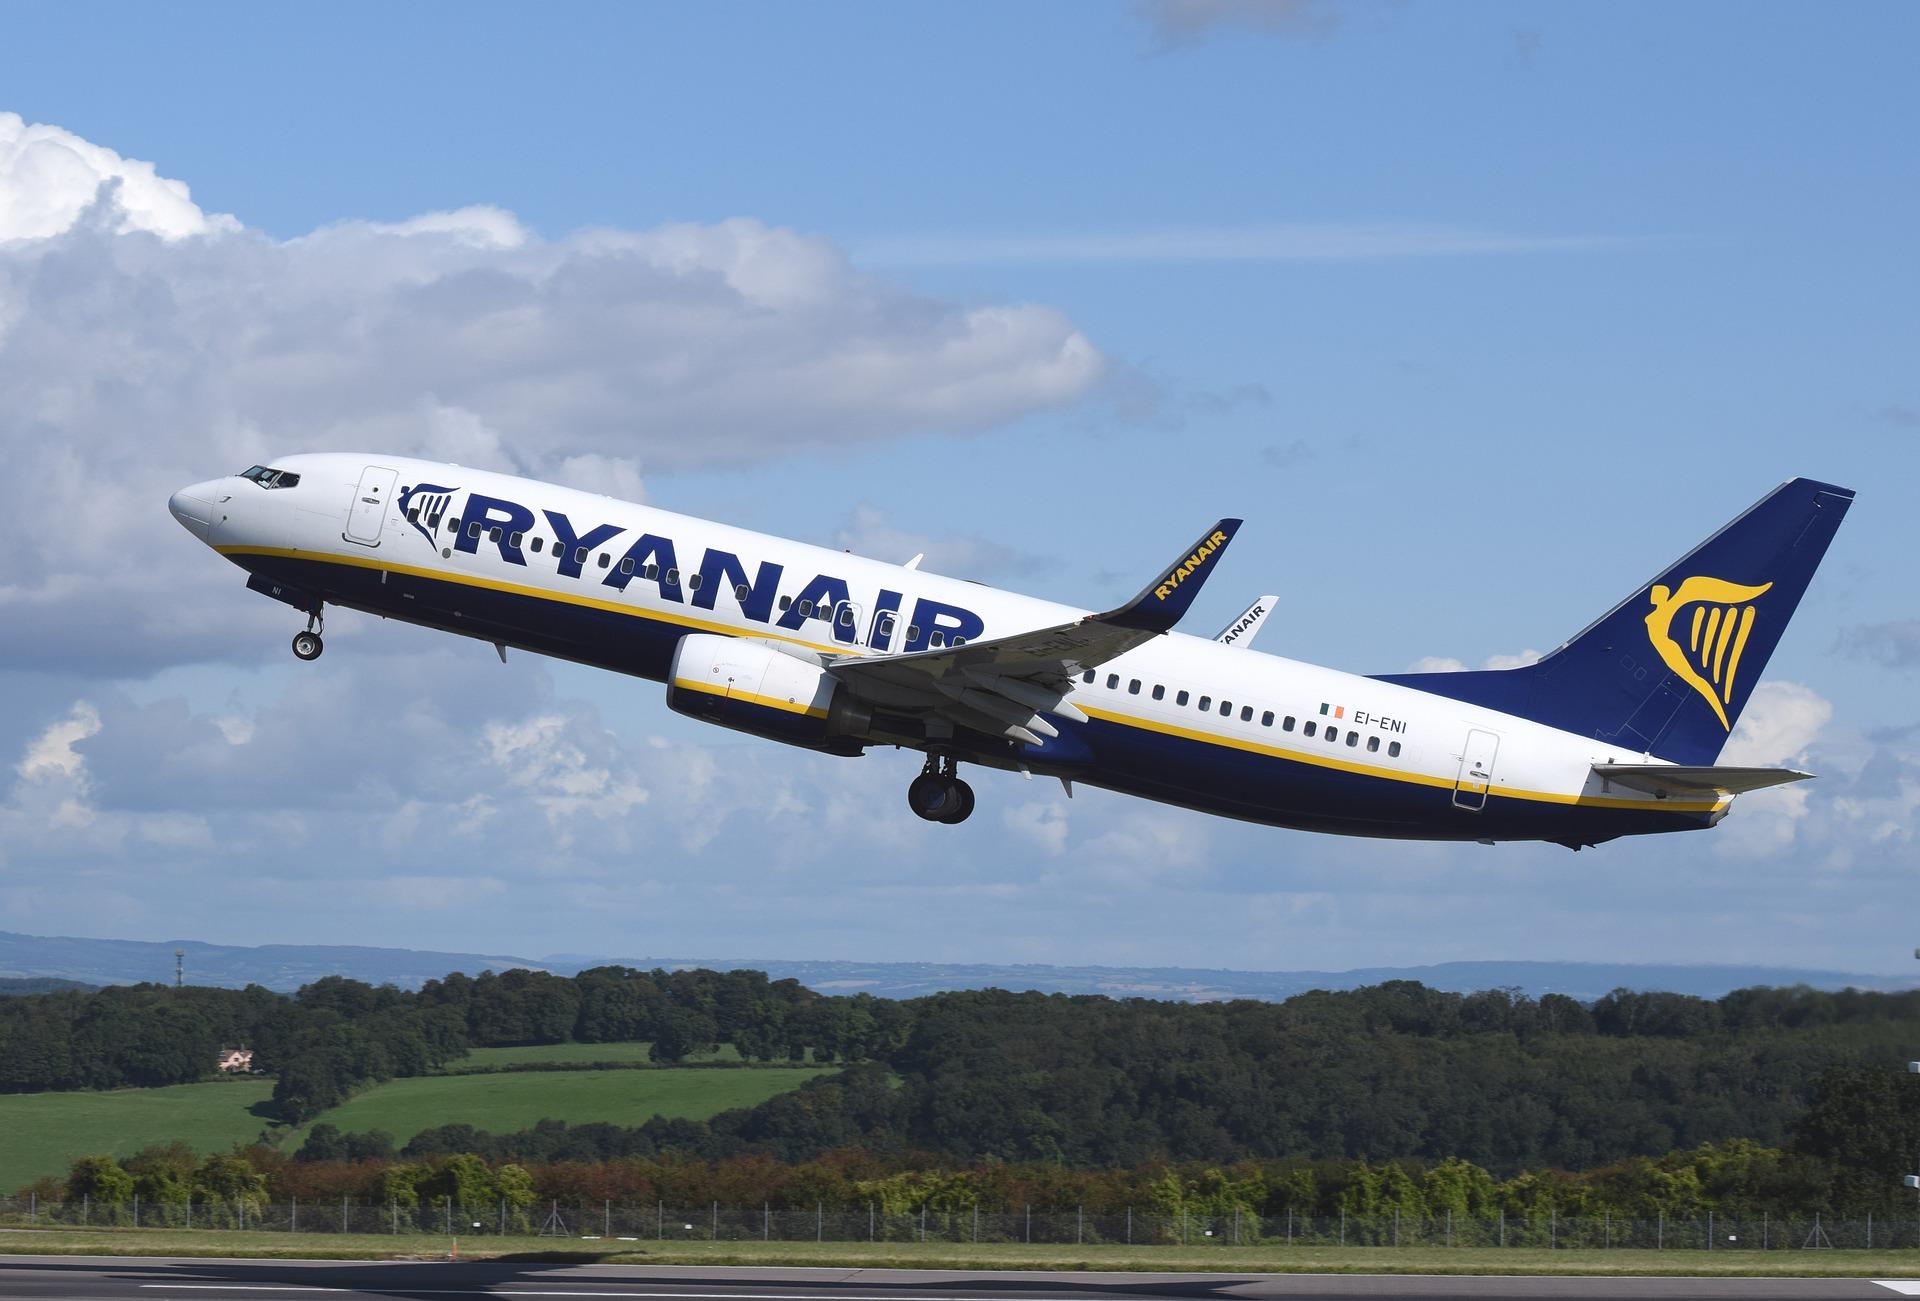 Airport-Ryanair